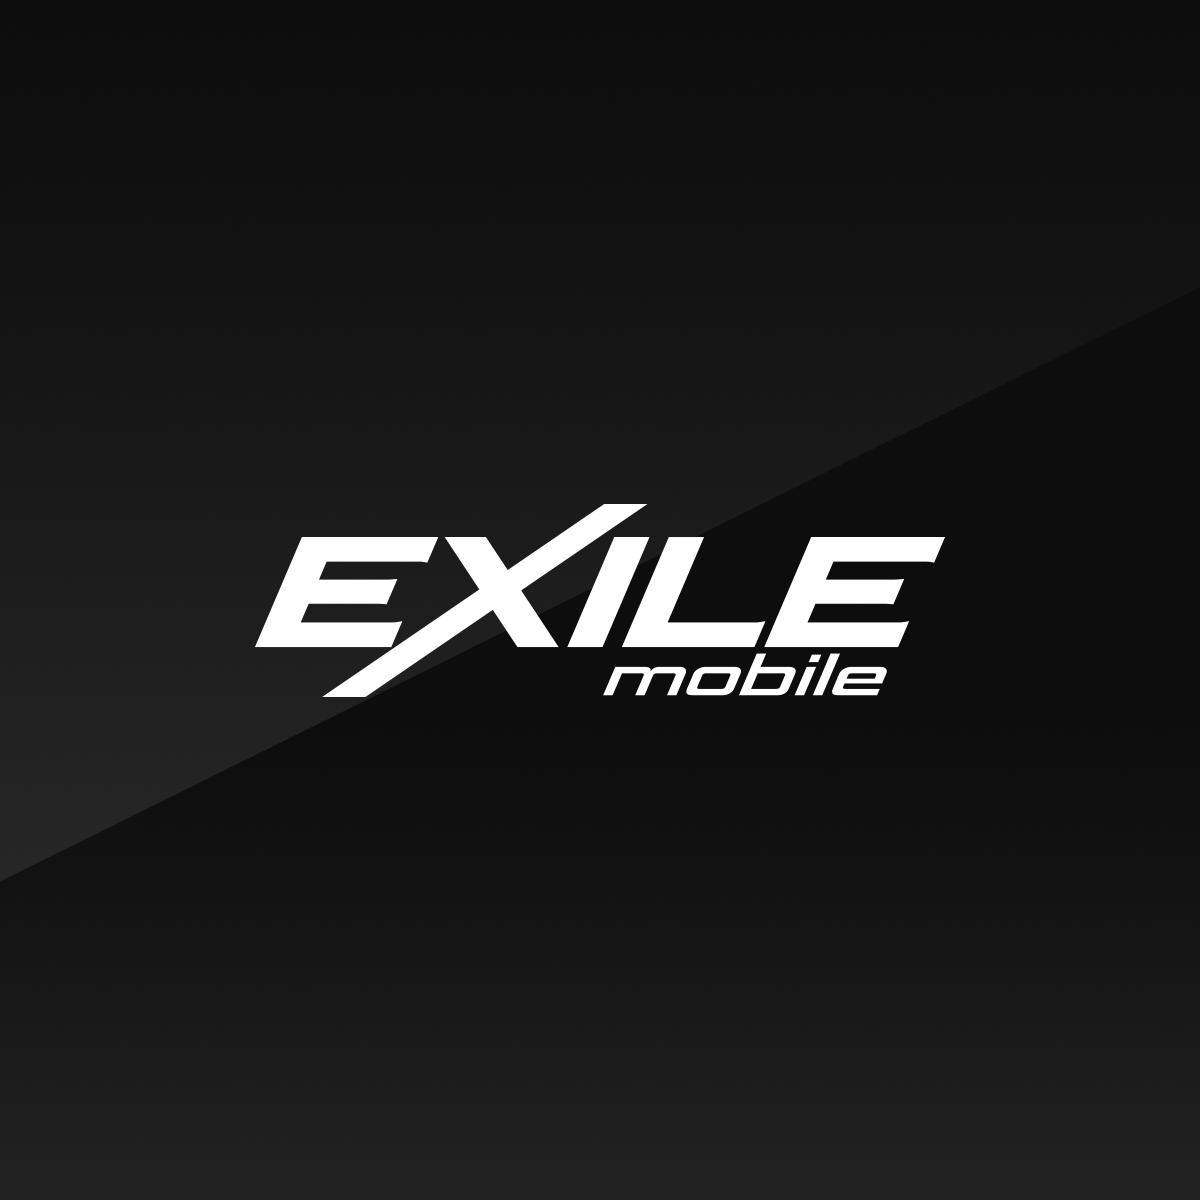 Exile Takahiro Exile Mobile